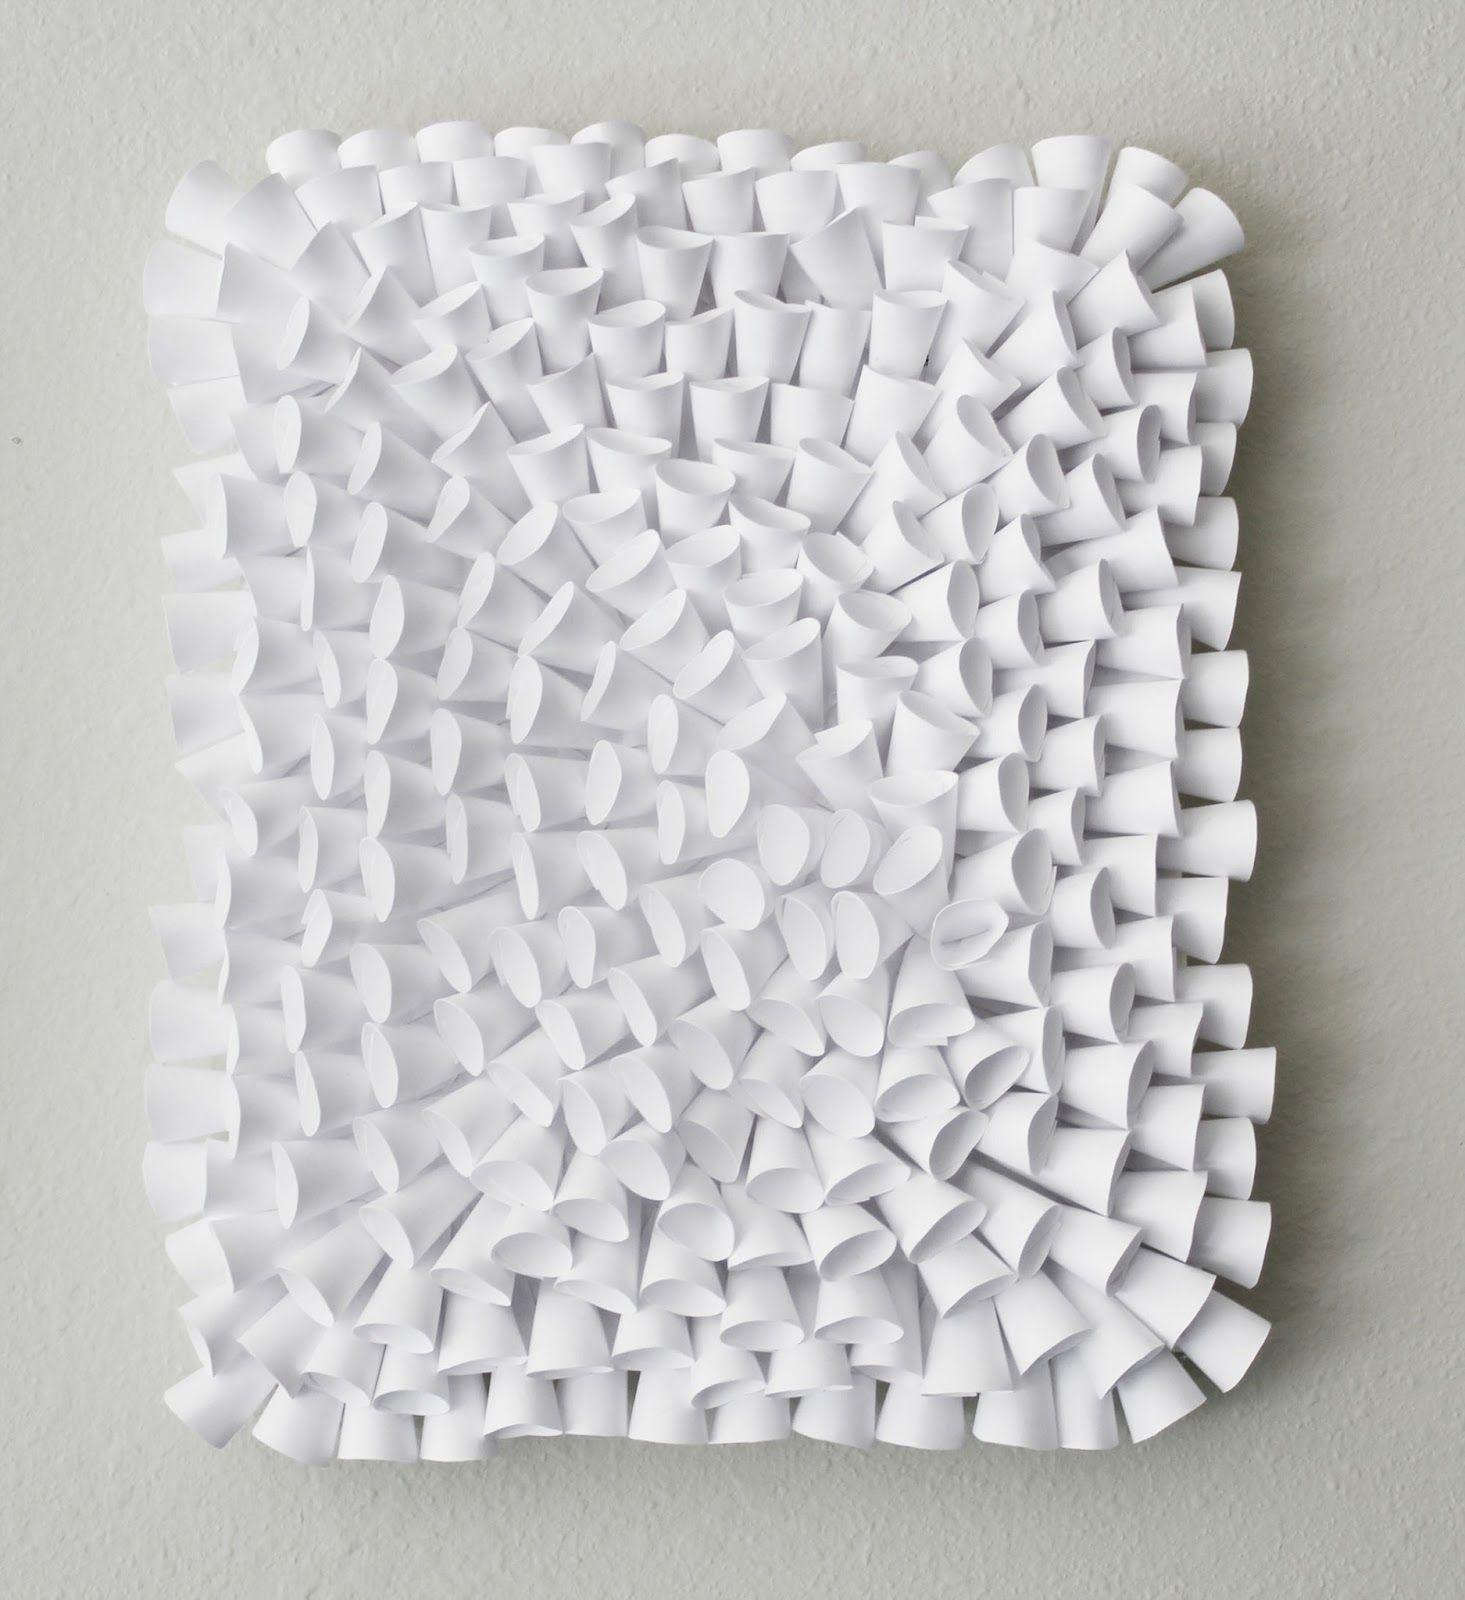 Paper Art Potpourri  Momichka White Paper Sculpture  Coral